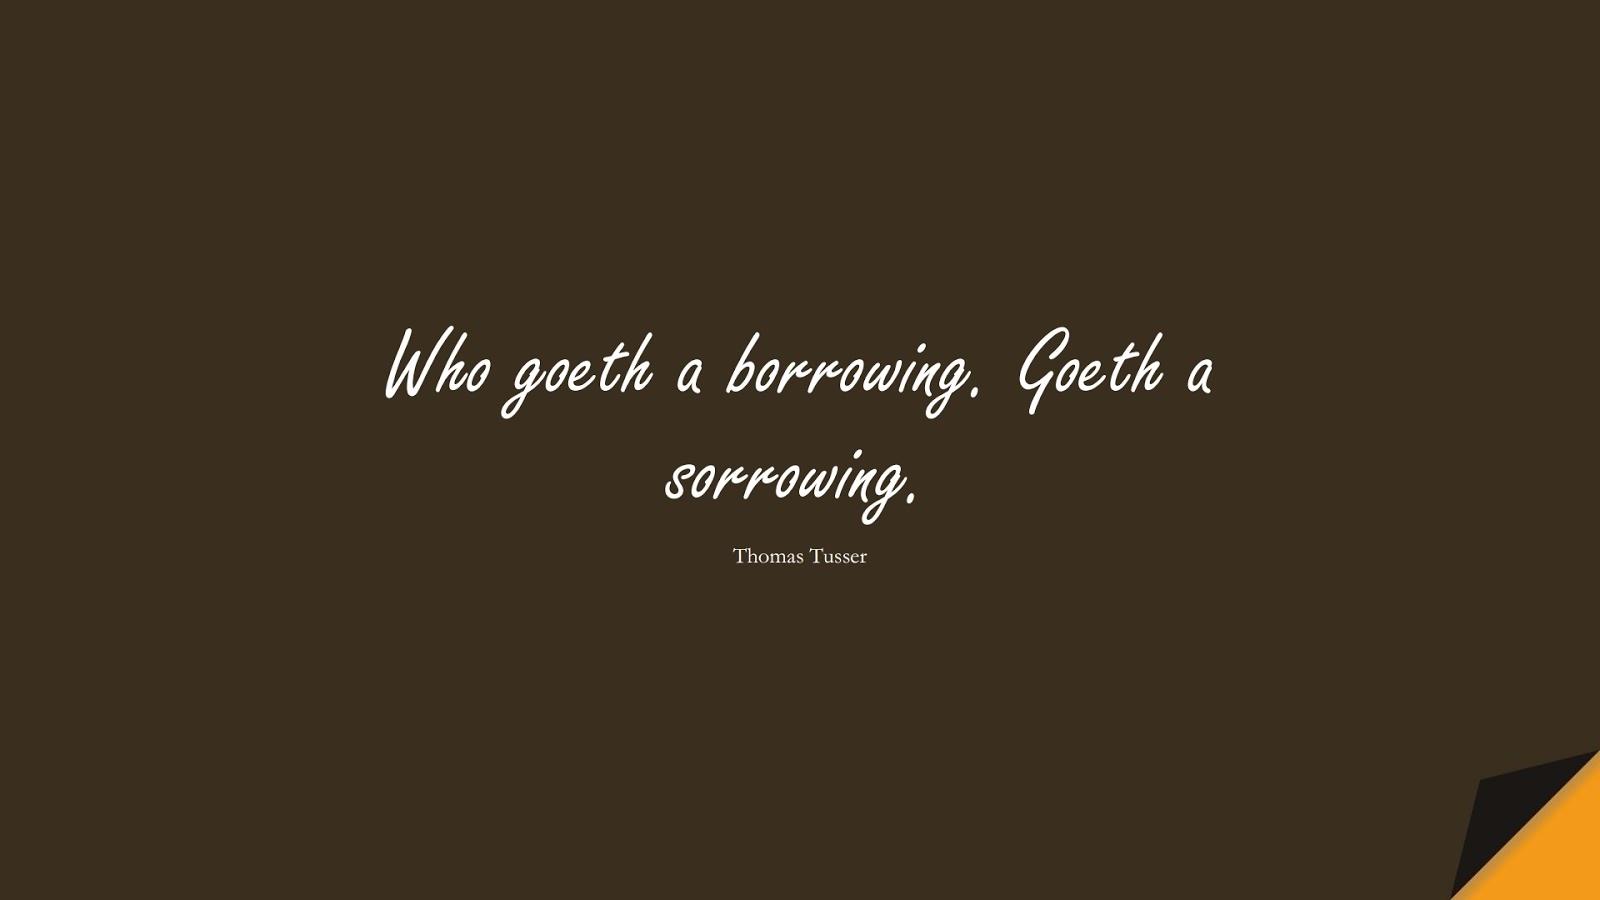 Who goeth a borrowing. Goeth a sorrowing. (Thomas Tusser);  #MoneyQuotes